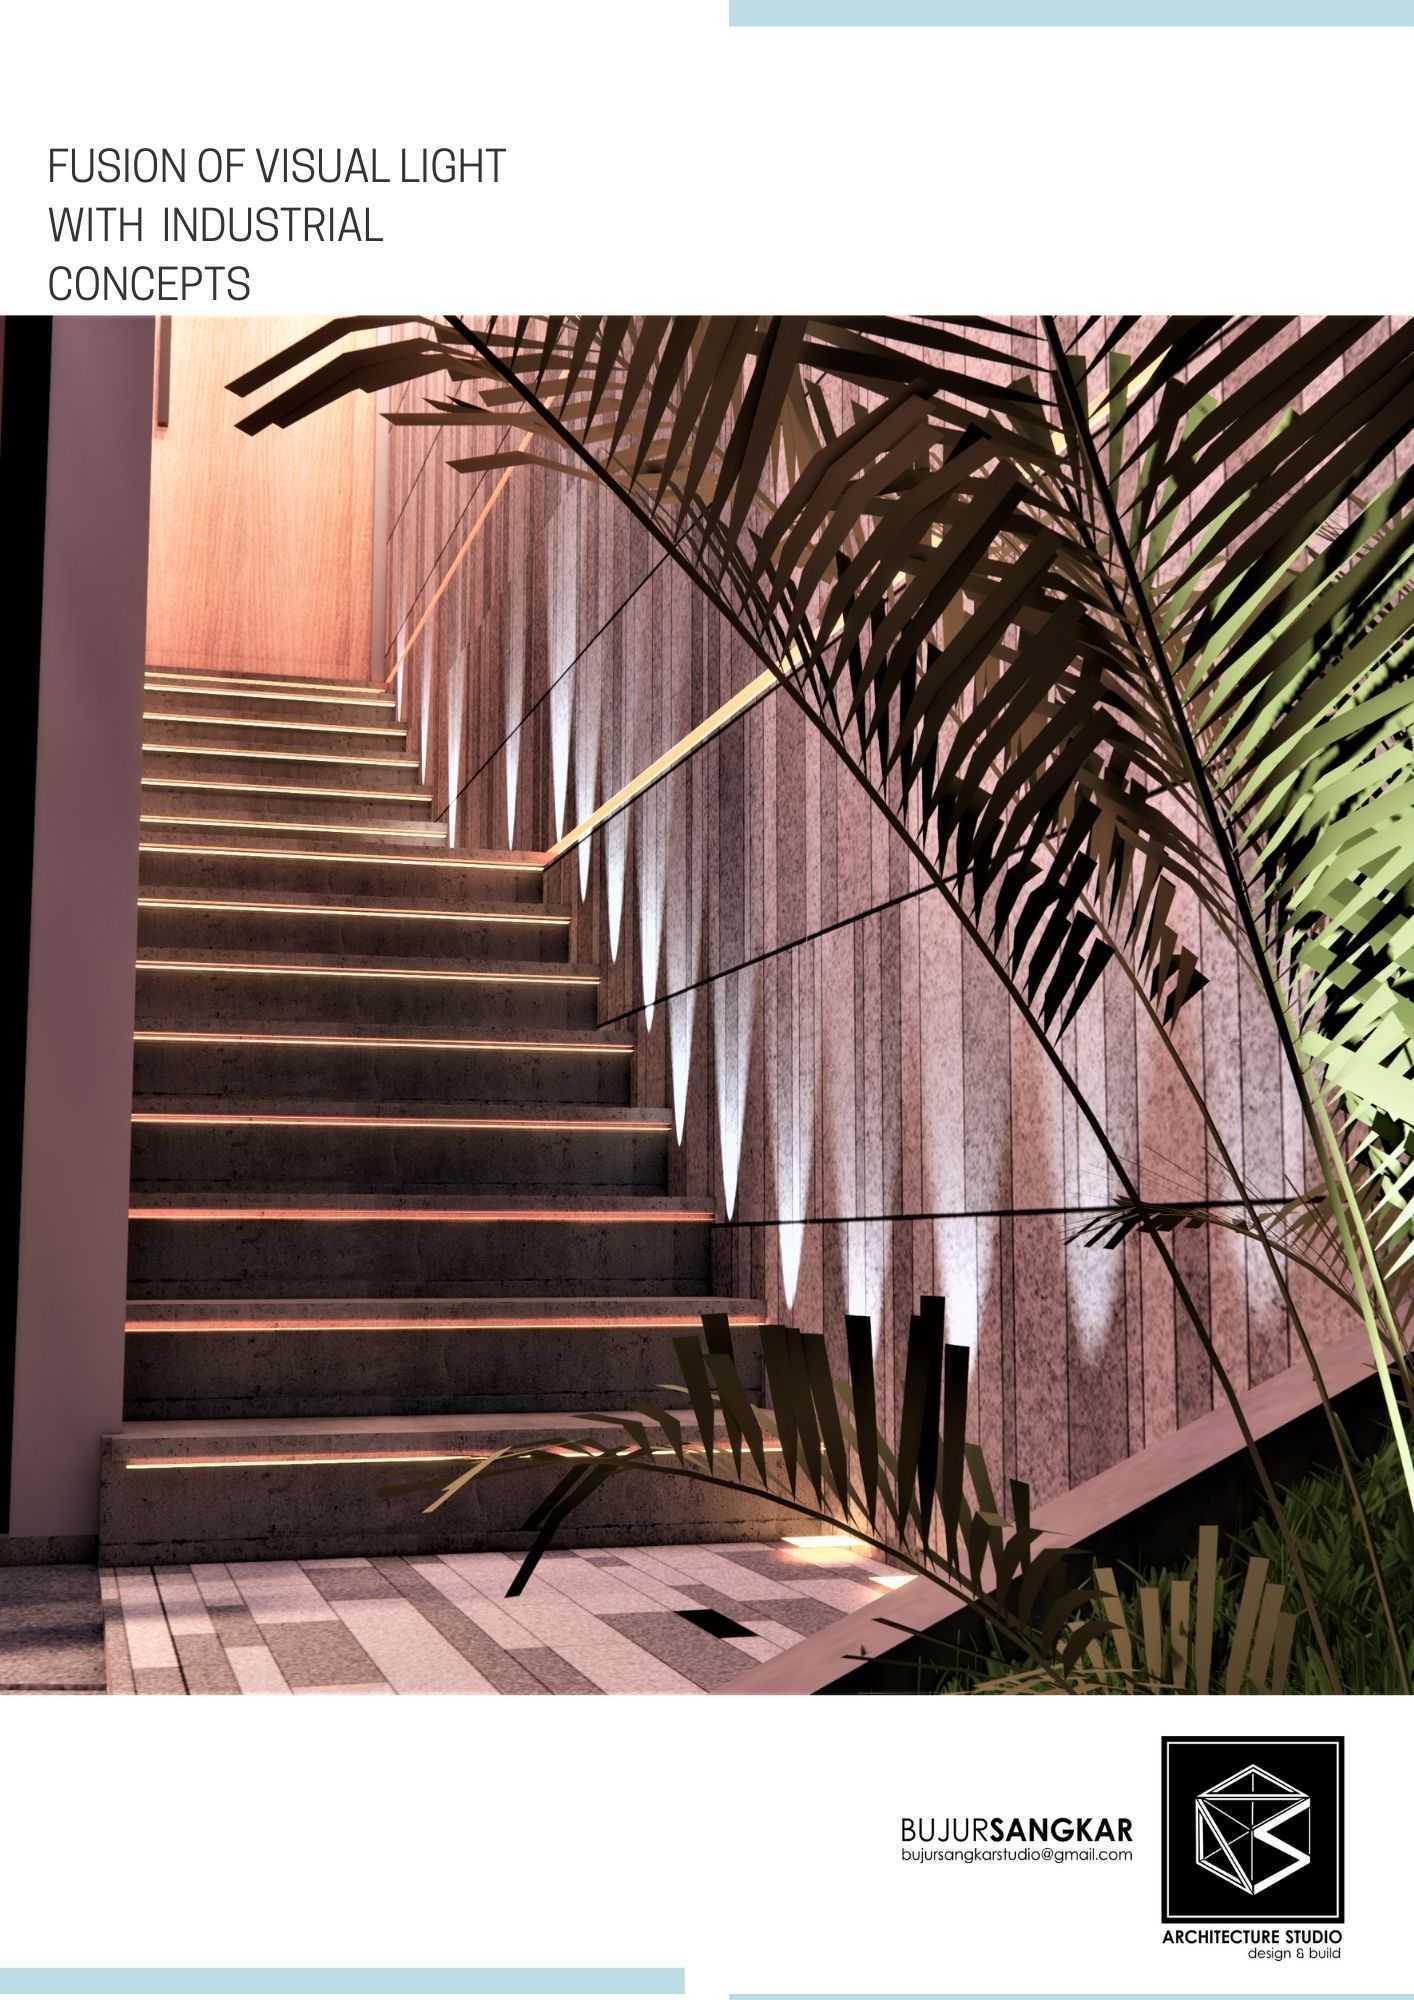 Bujursangkar Architect Fusion Of Visual Light With Industrial Concepts . Makassar, Kota Makassar, Sulawesi Selatan, Indonesia Makassar, Kota Makassar, Sulawesi Selatan, Indonesia Fusion Of Visual Light With Industrial Concepts Minimalist 111336